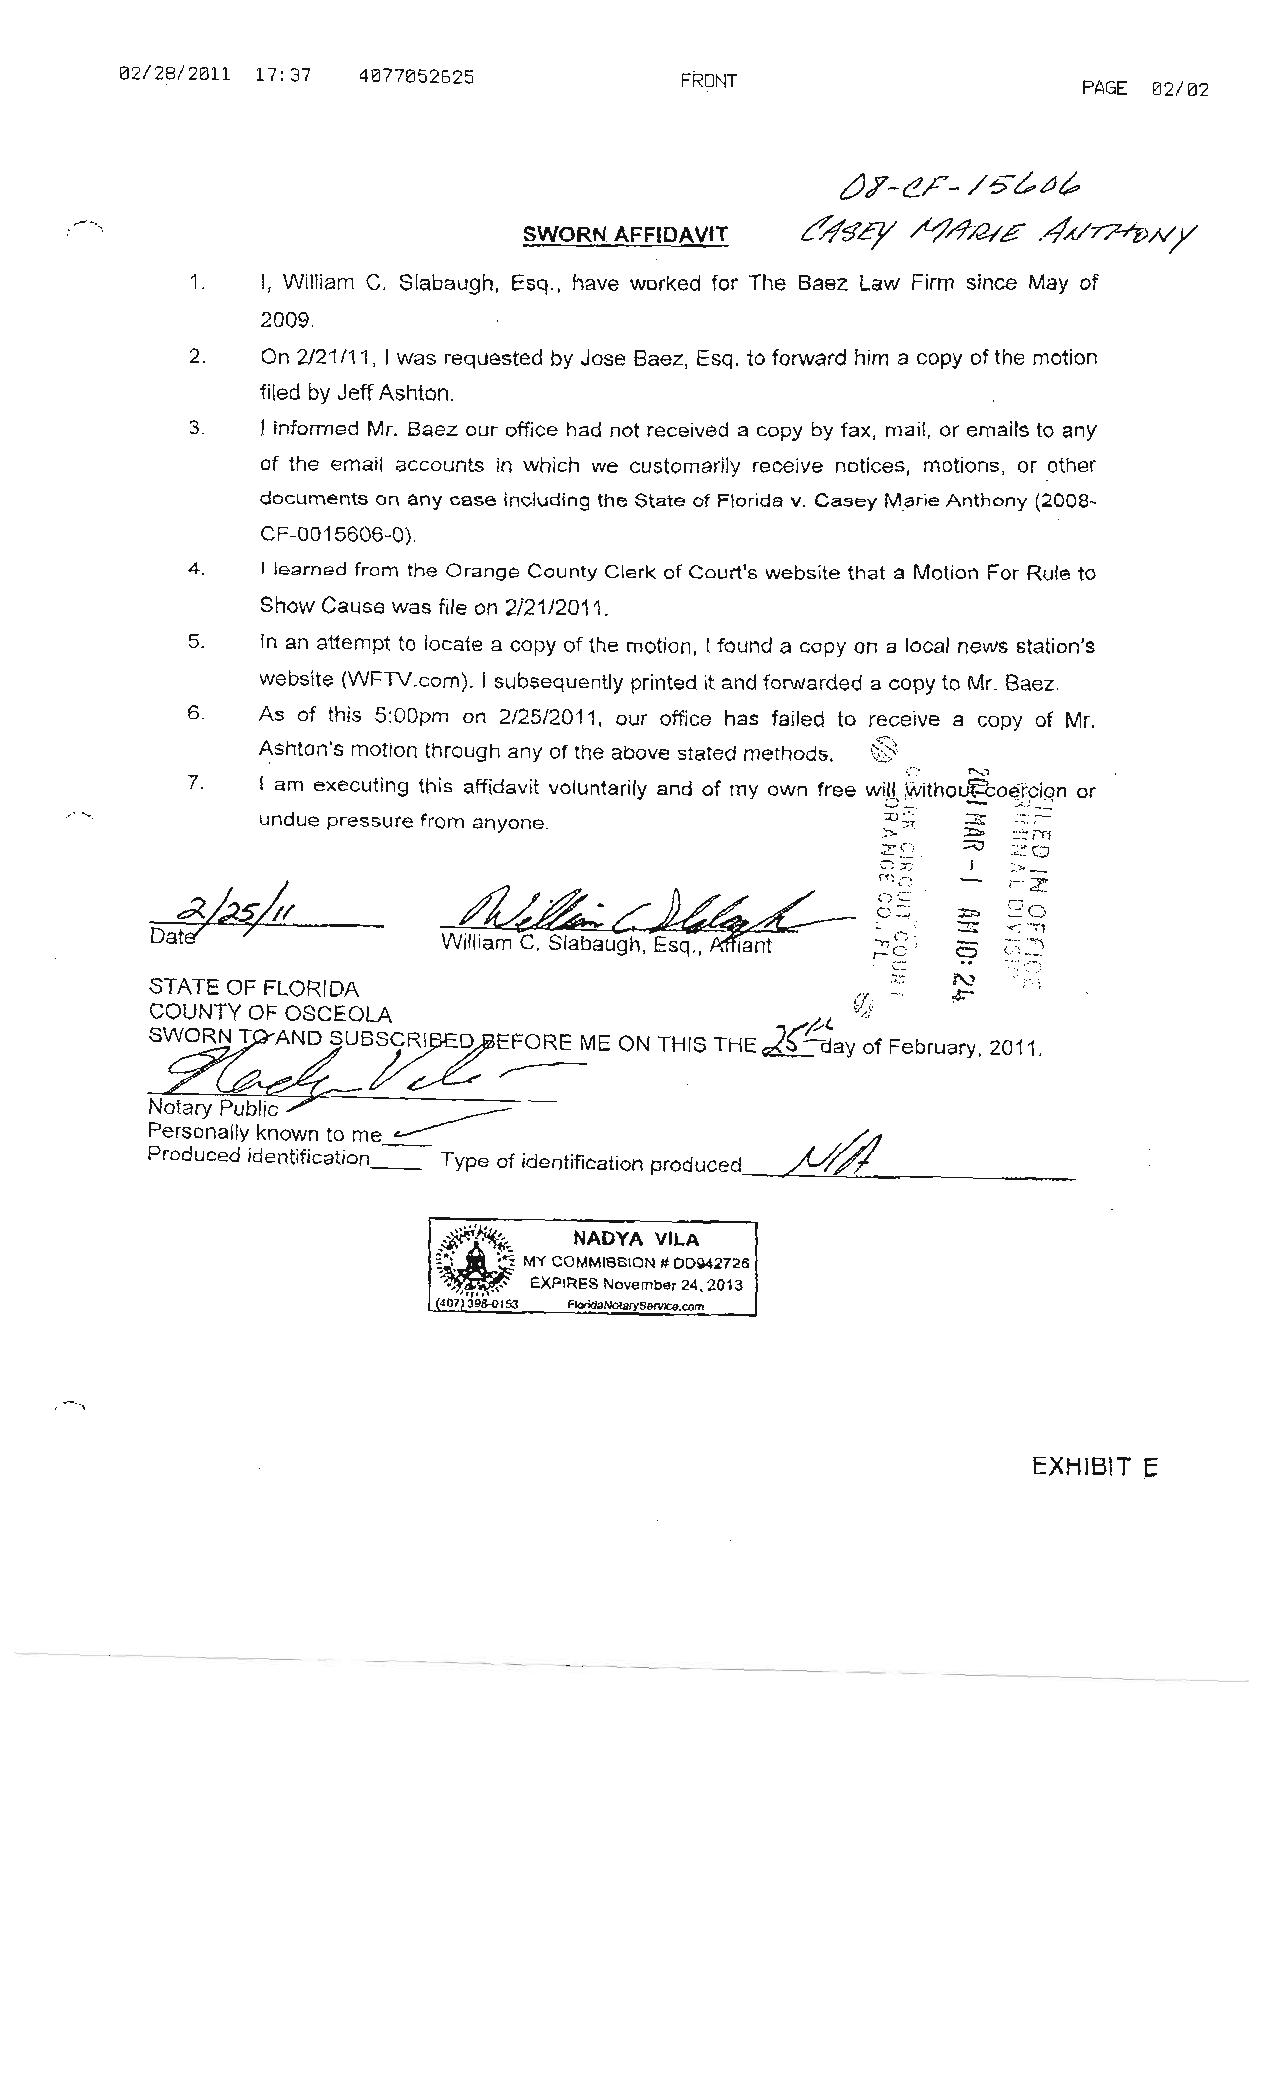 how to get a sworn affidavit